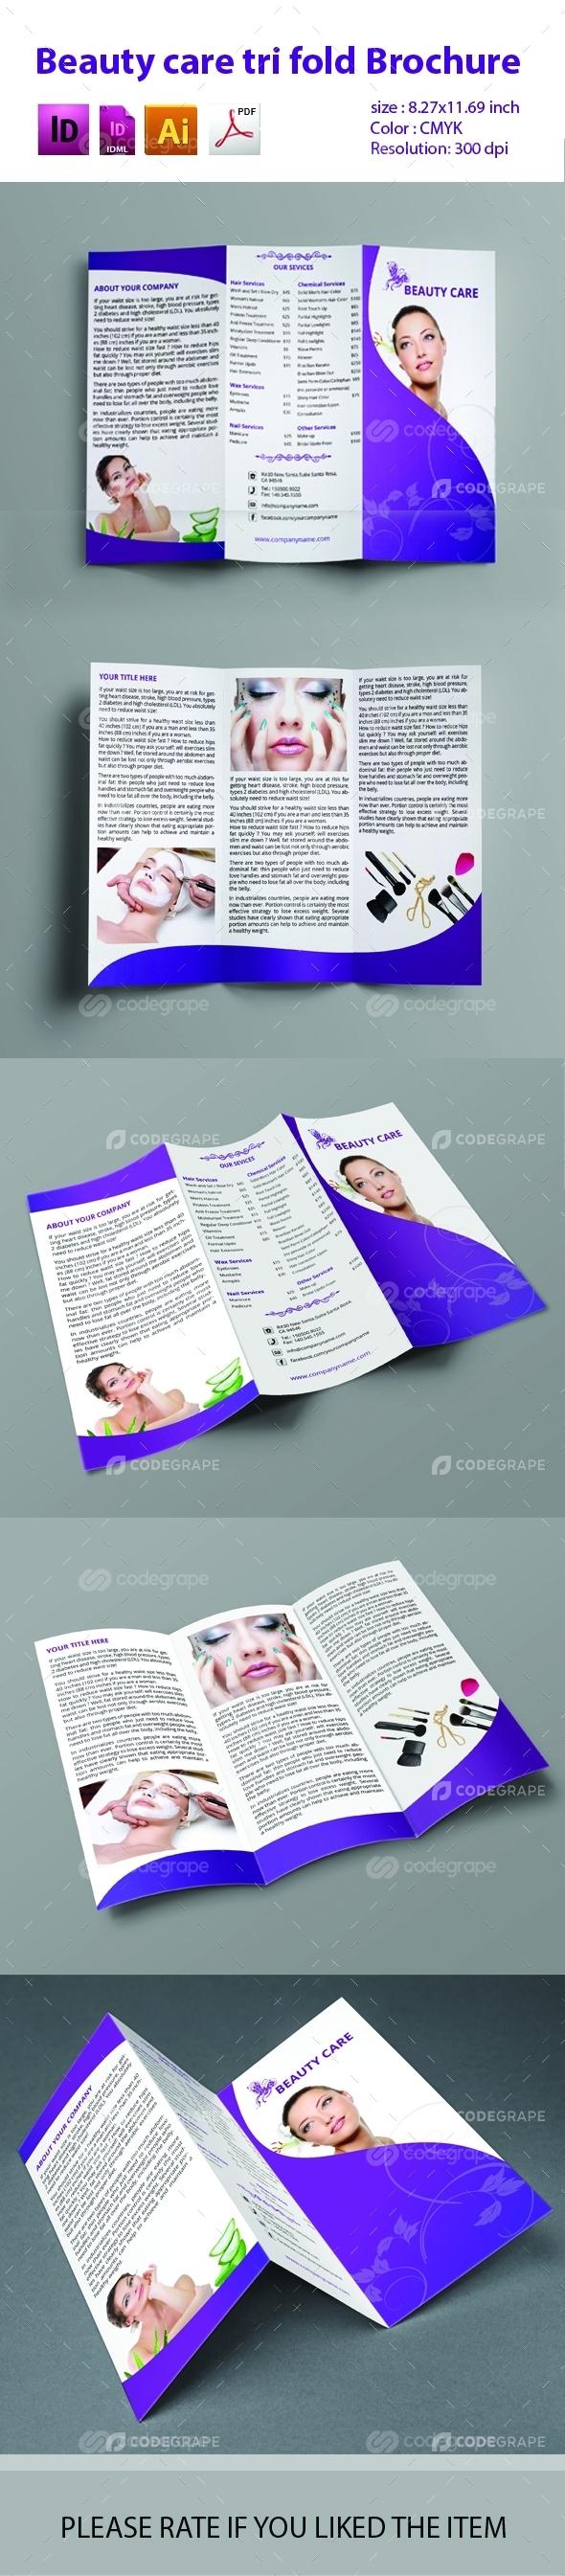 Beauty Care Tri Fold Brochure